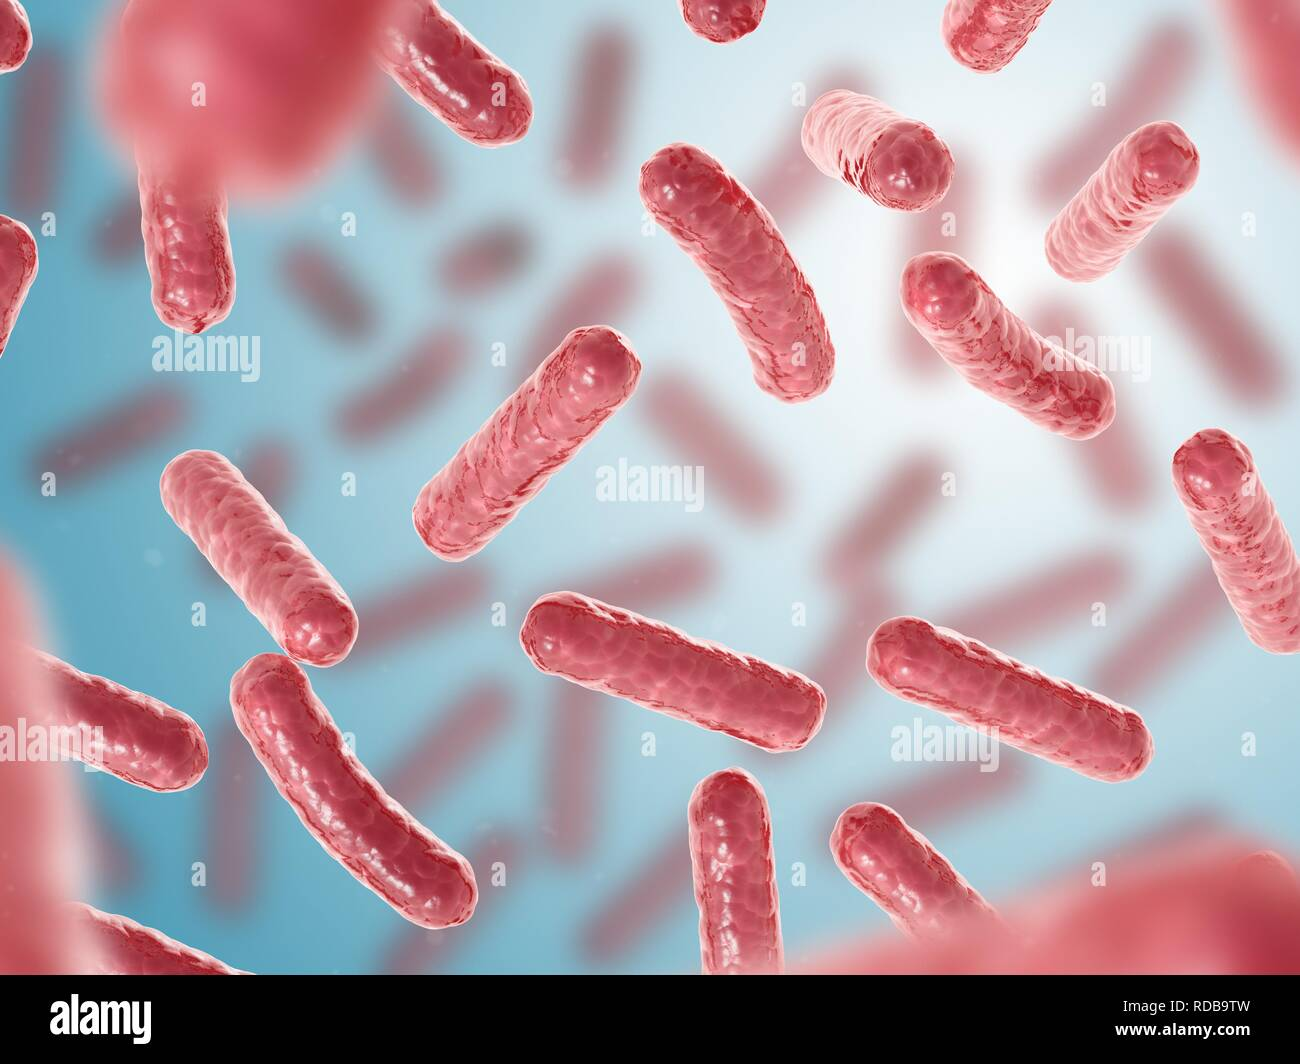 Bacteria close up - Stock Image